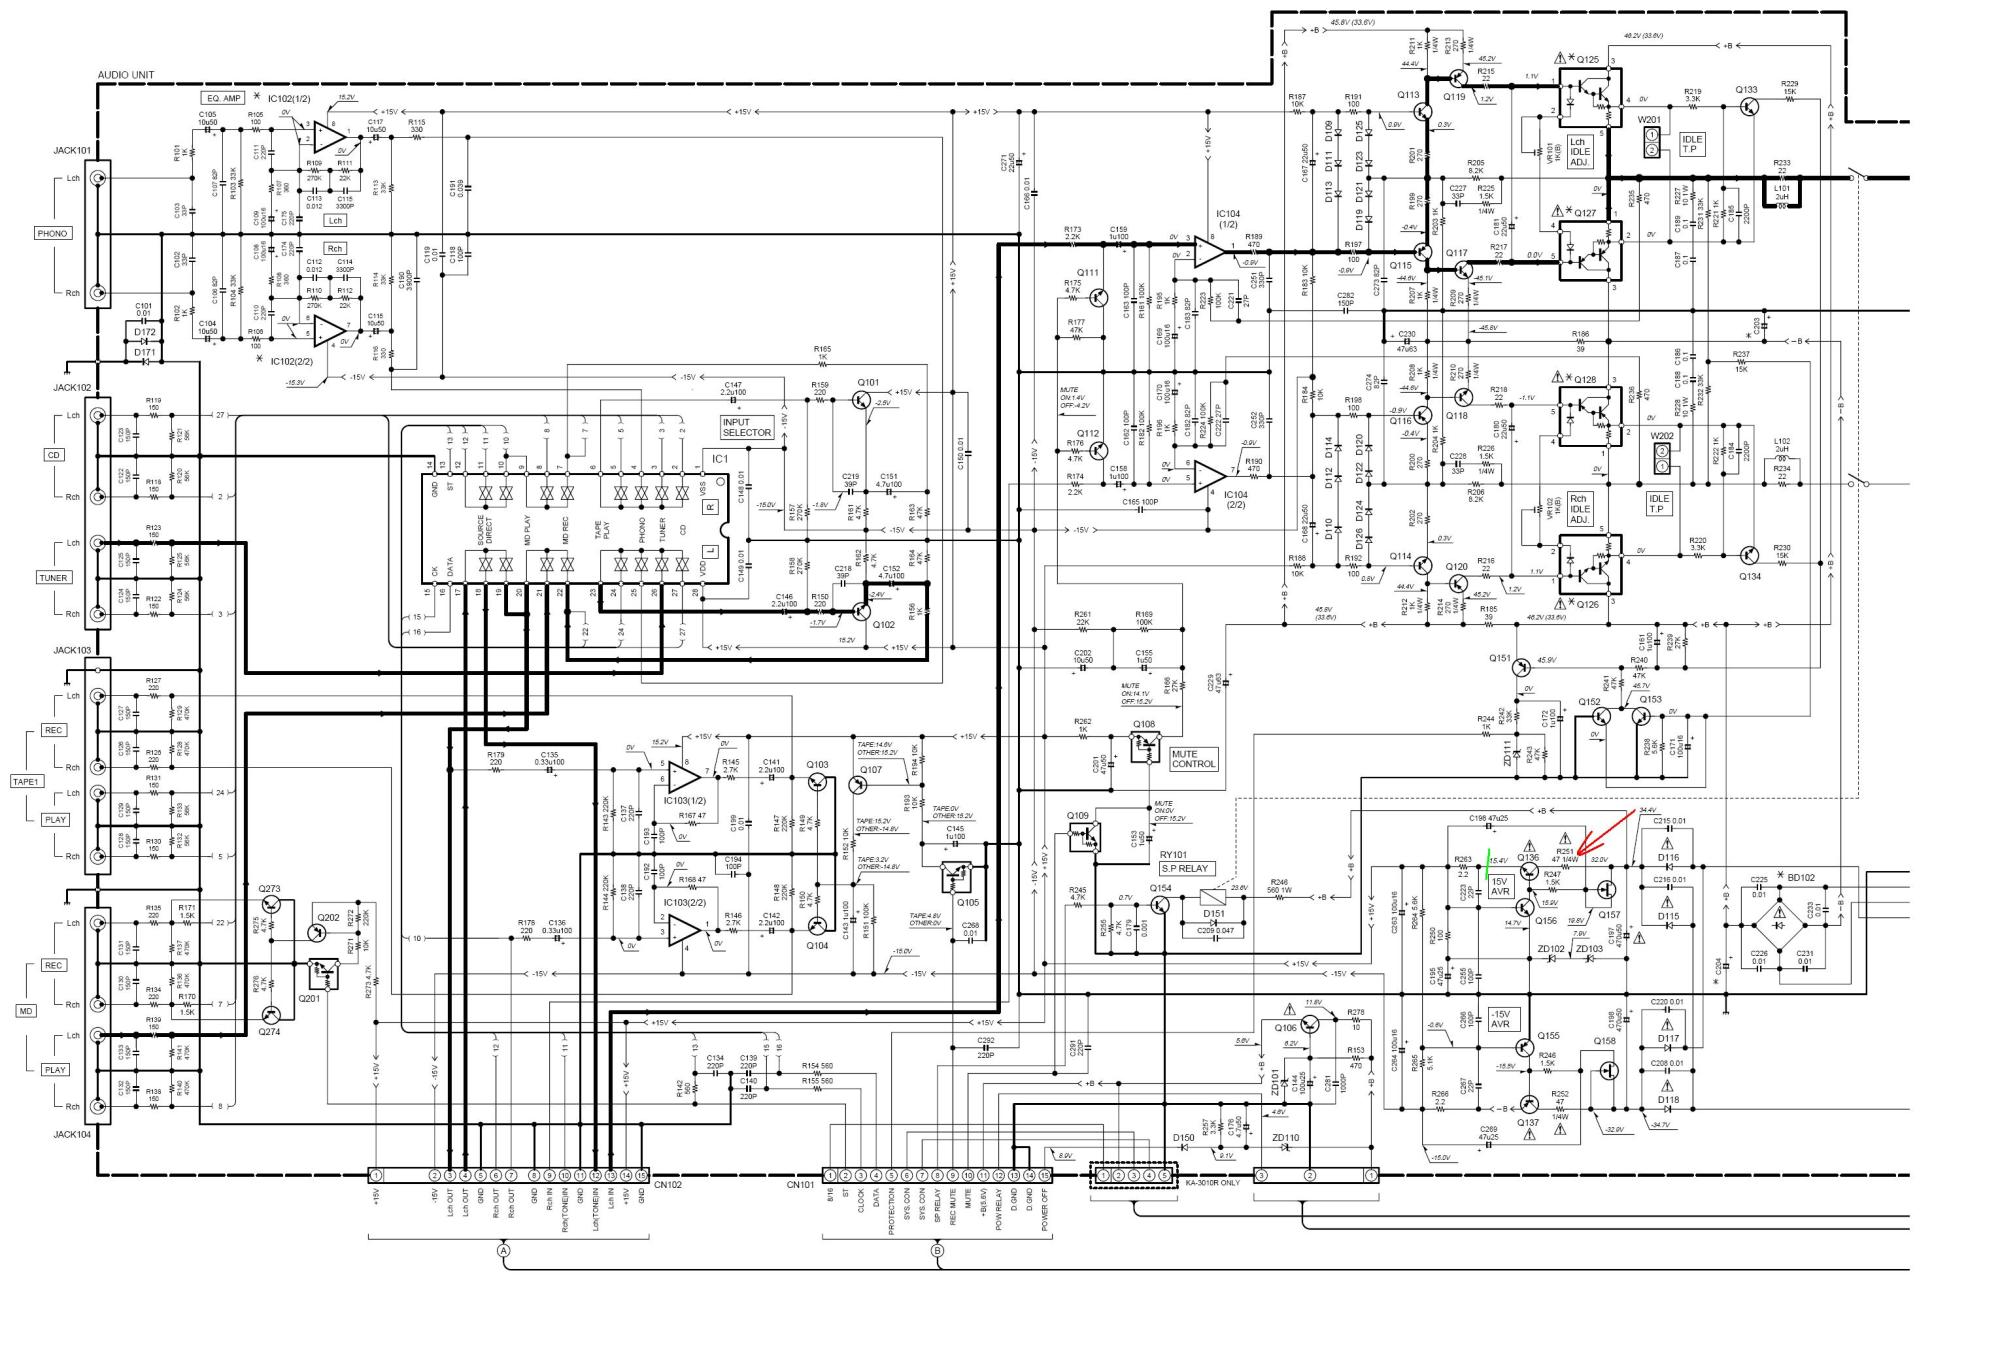 hight resolution of kenwood mc 42s mic wiring diagram kenwood service manuals schematics ajilbabcom portal picture kenwood service manuals